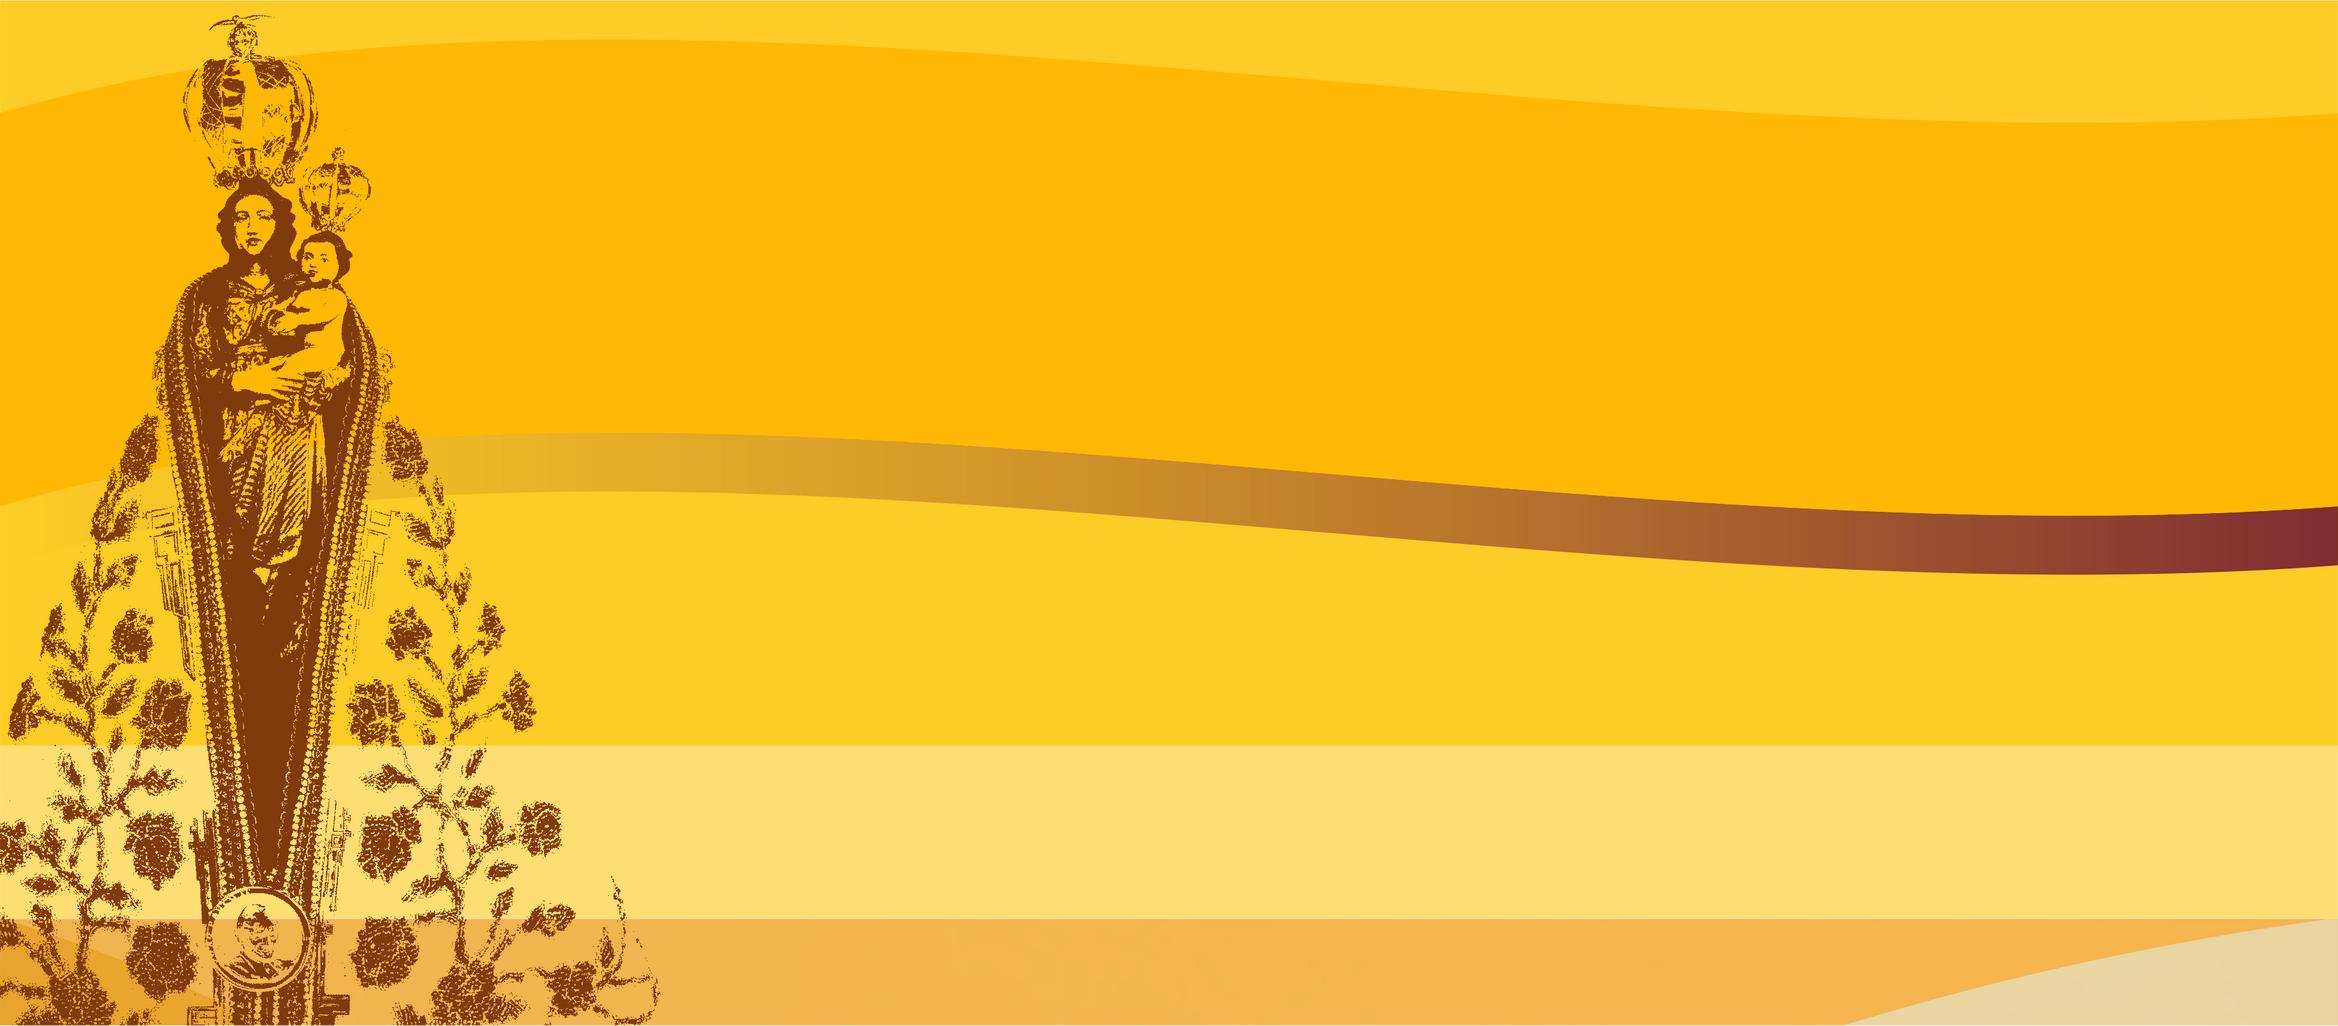 Banner Nortao sem escritos